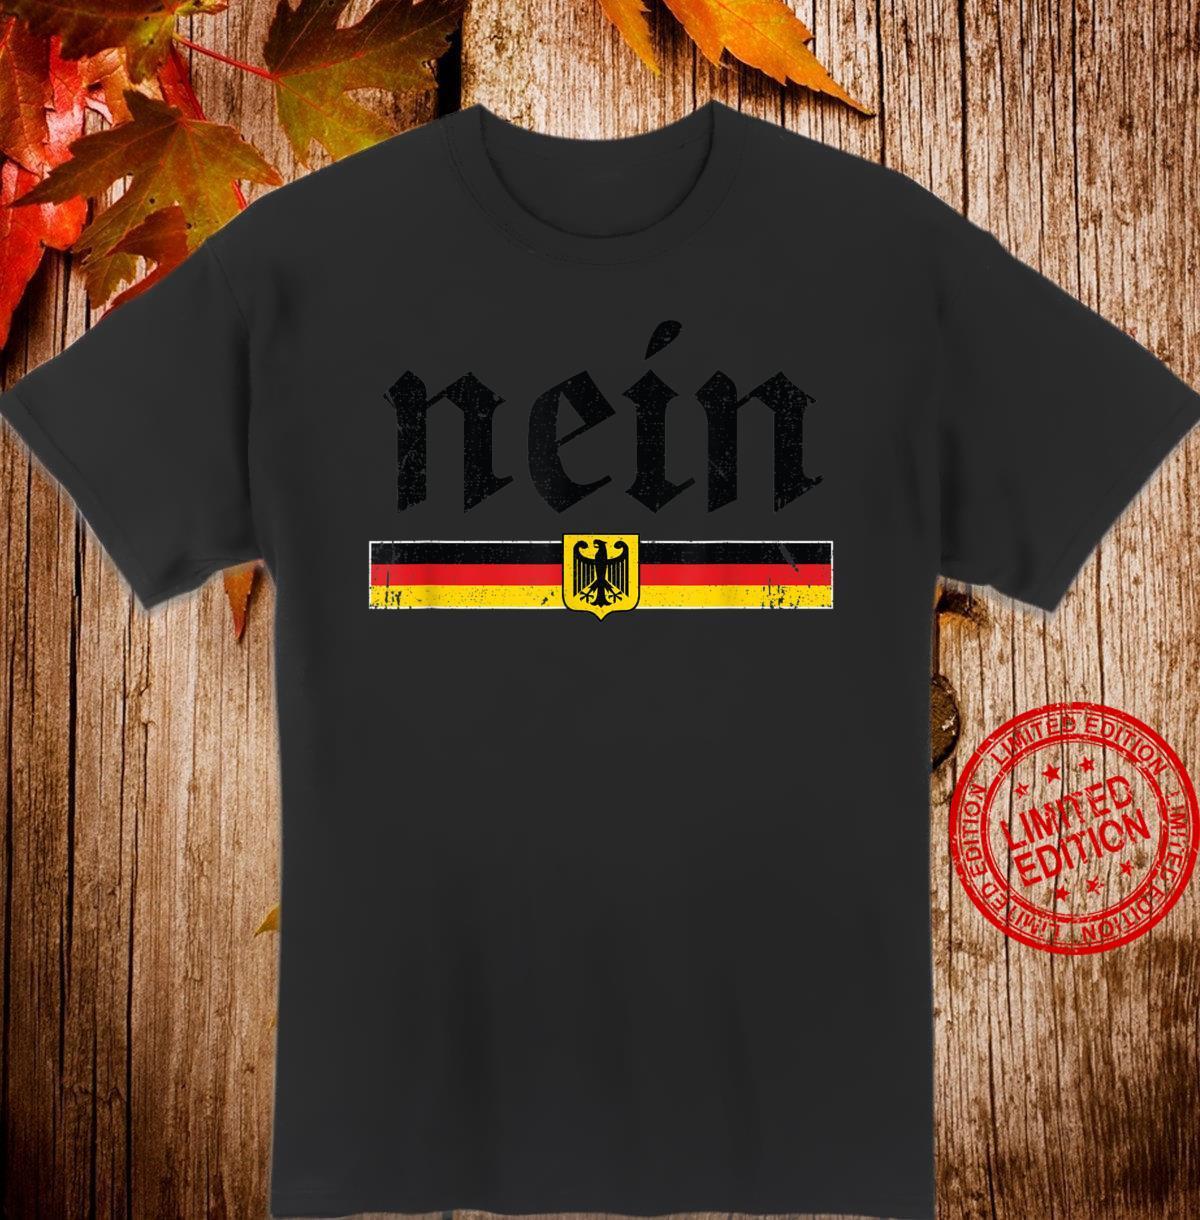 Vintage Nein Shirt German Oktoberfest Shirt